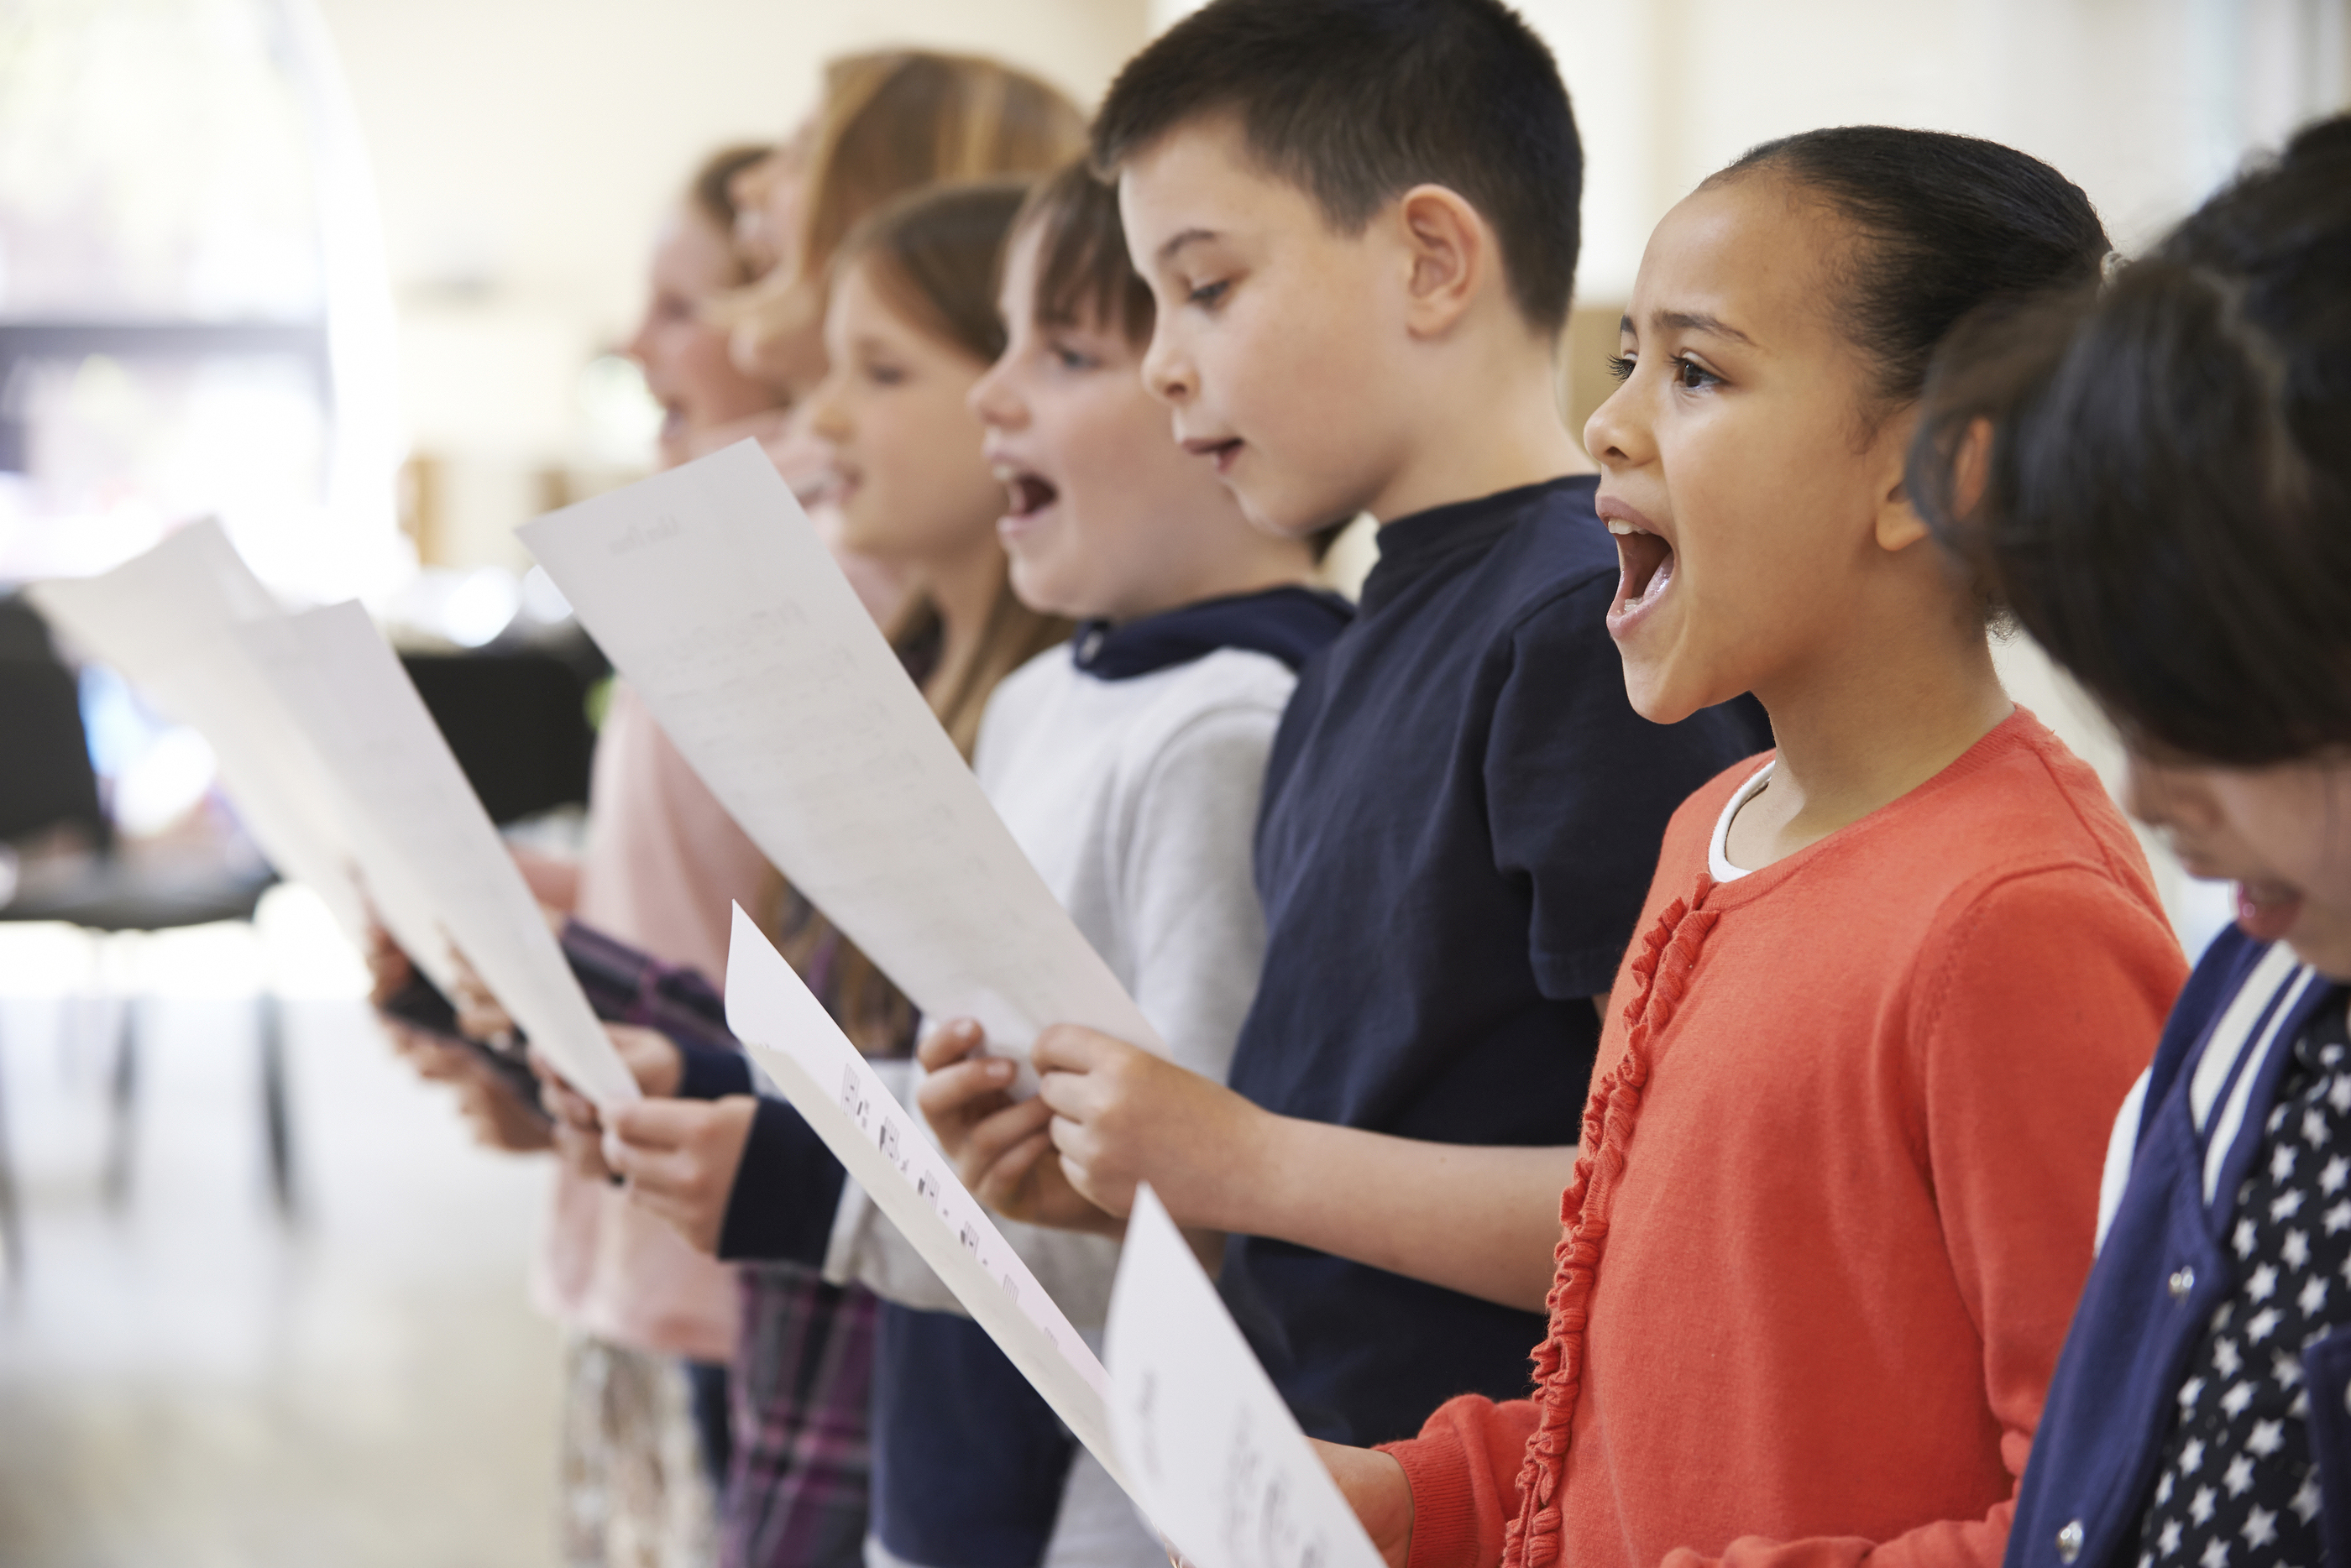 Bermuda School Of Music, The